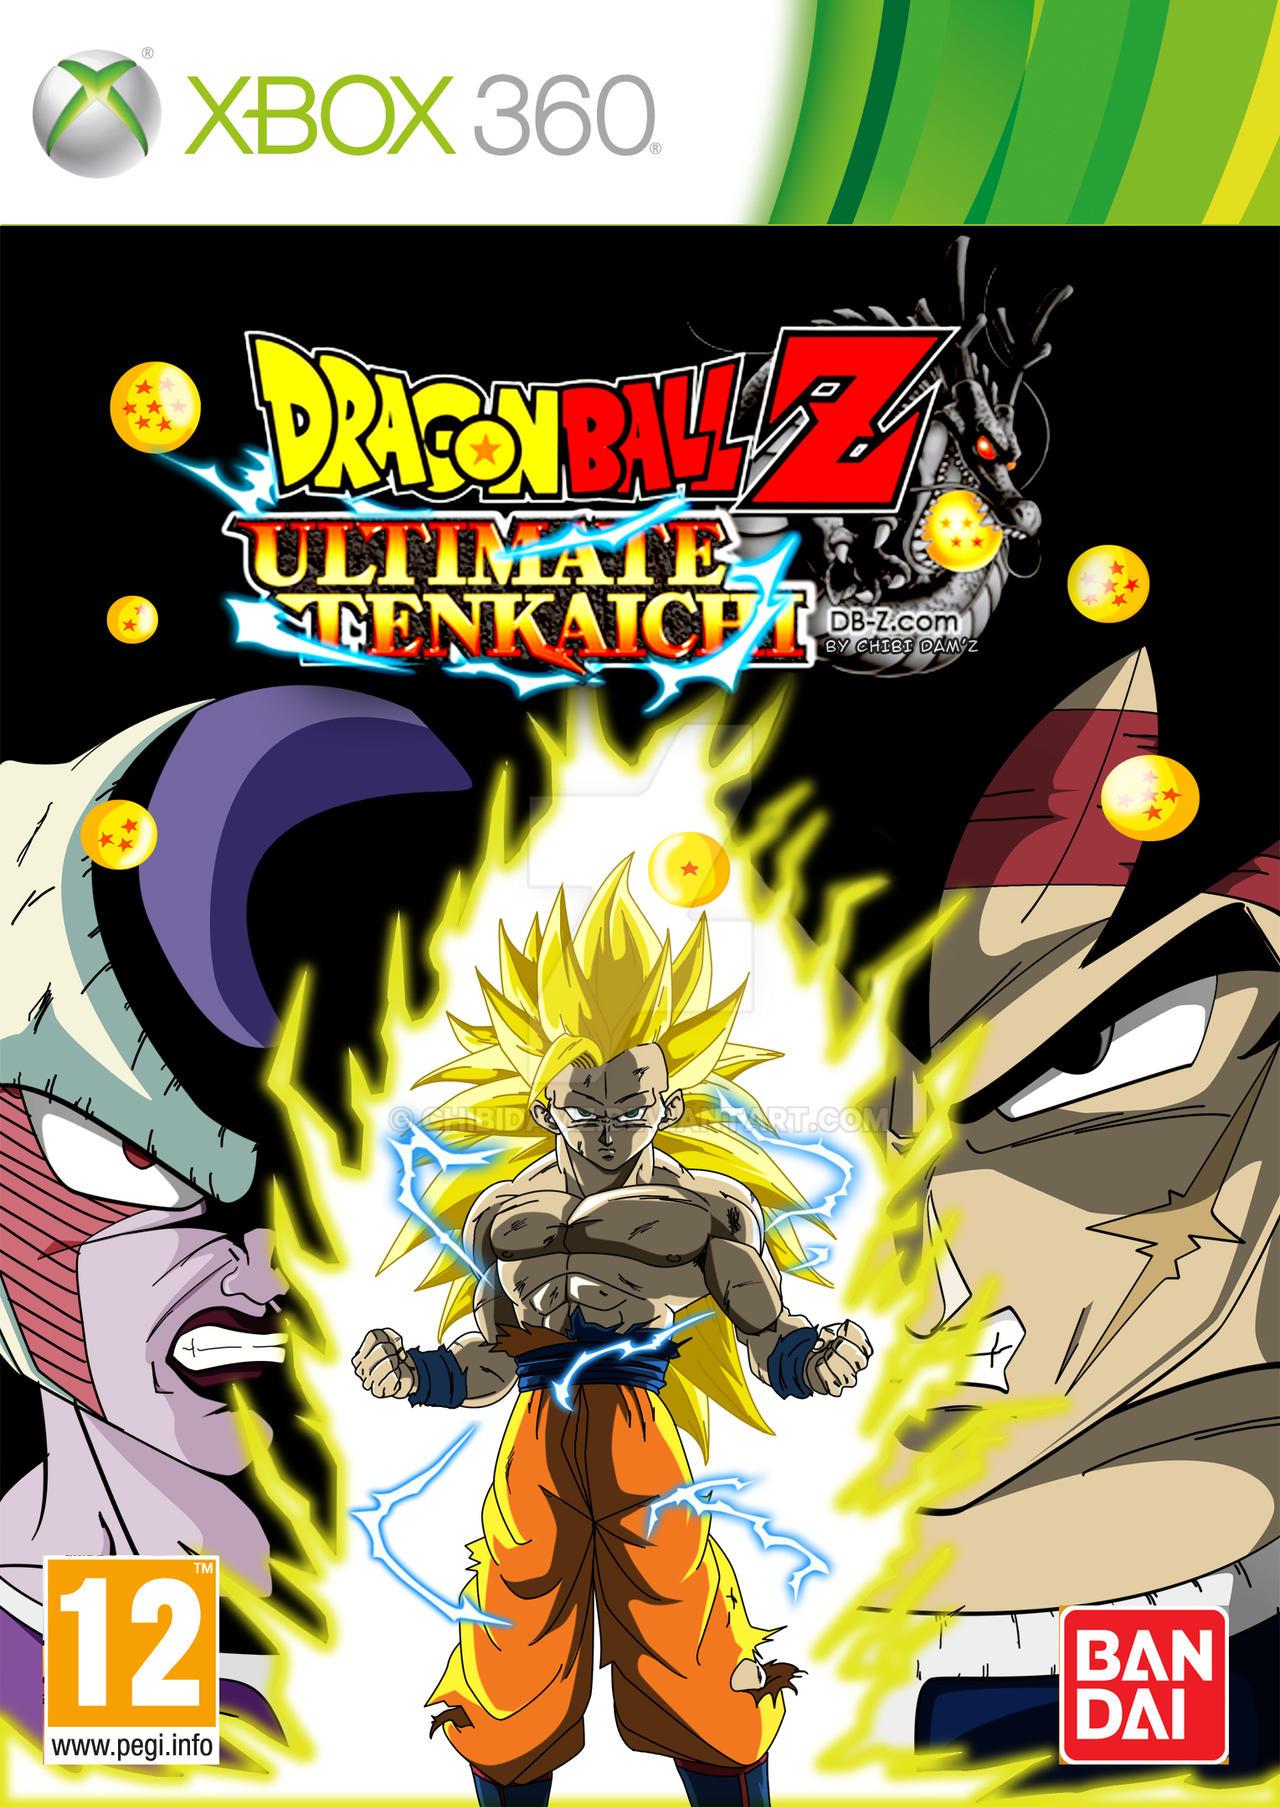 Ultimate tenkaichi xbox 360 by chibidamz on deviantart - Xbox anime gamer pictures ...